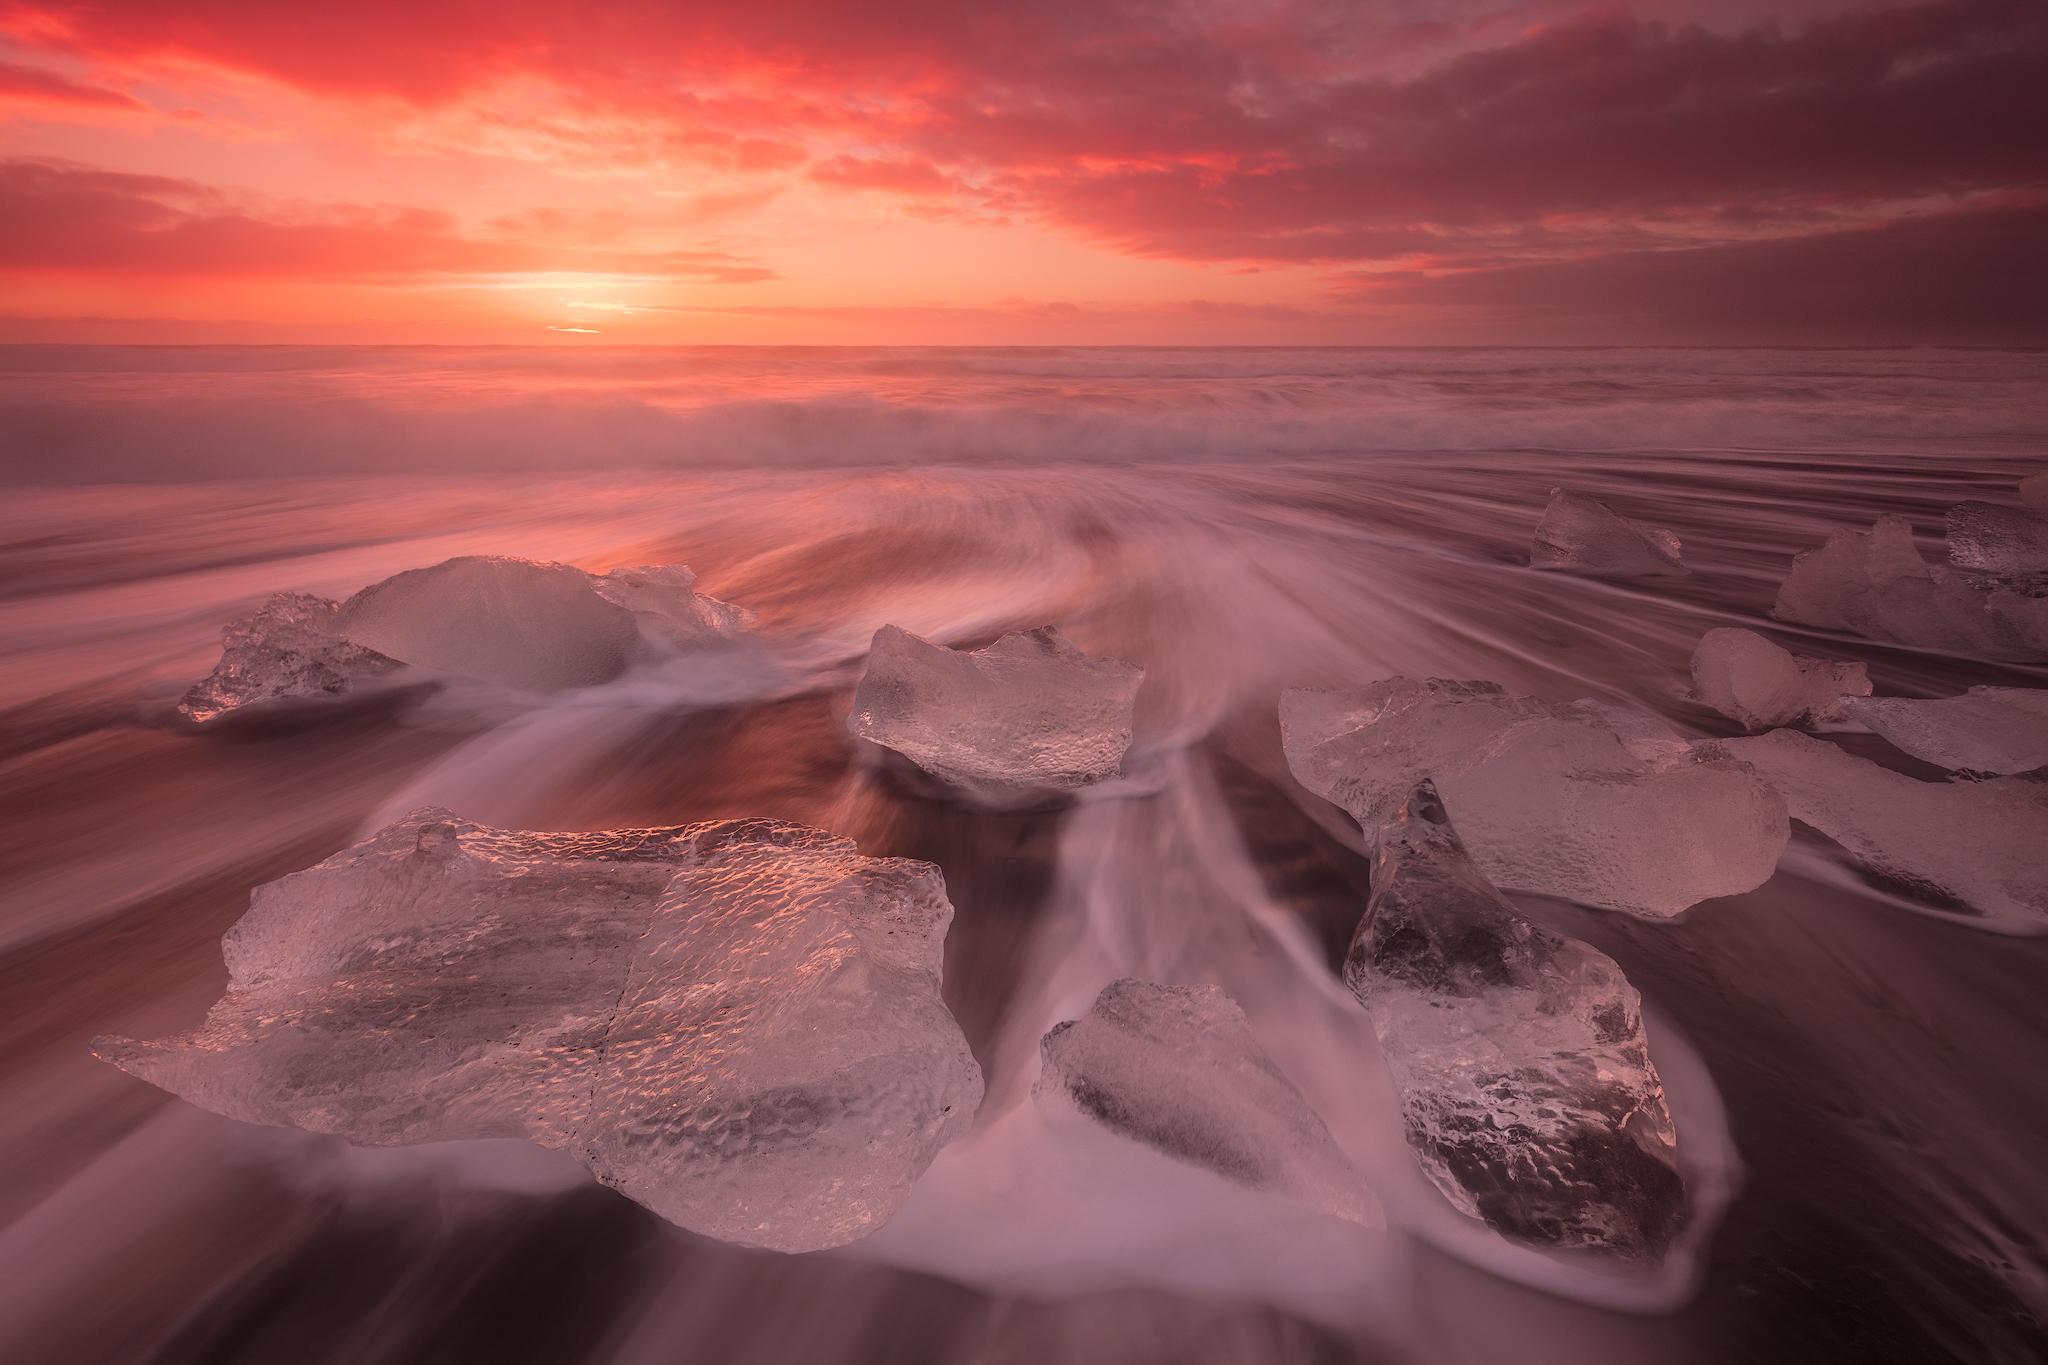 9 Day Photo Workshop Capturing Autumn in Iceland - day 5